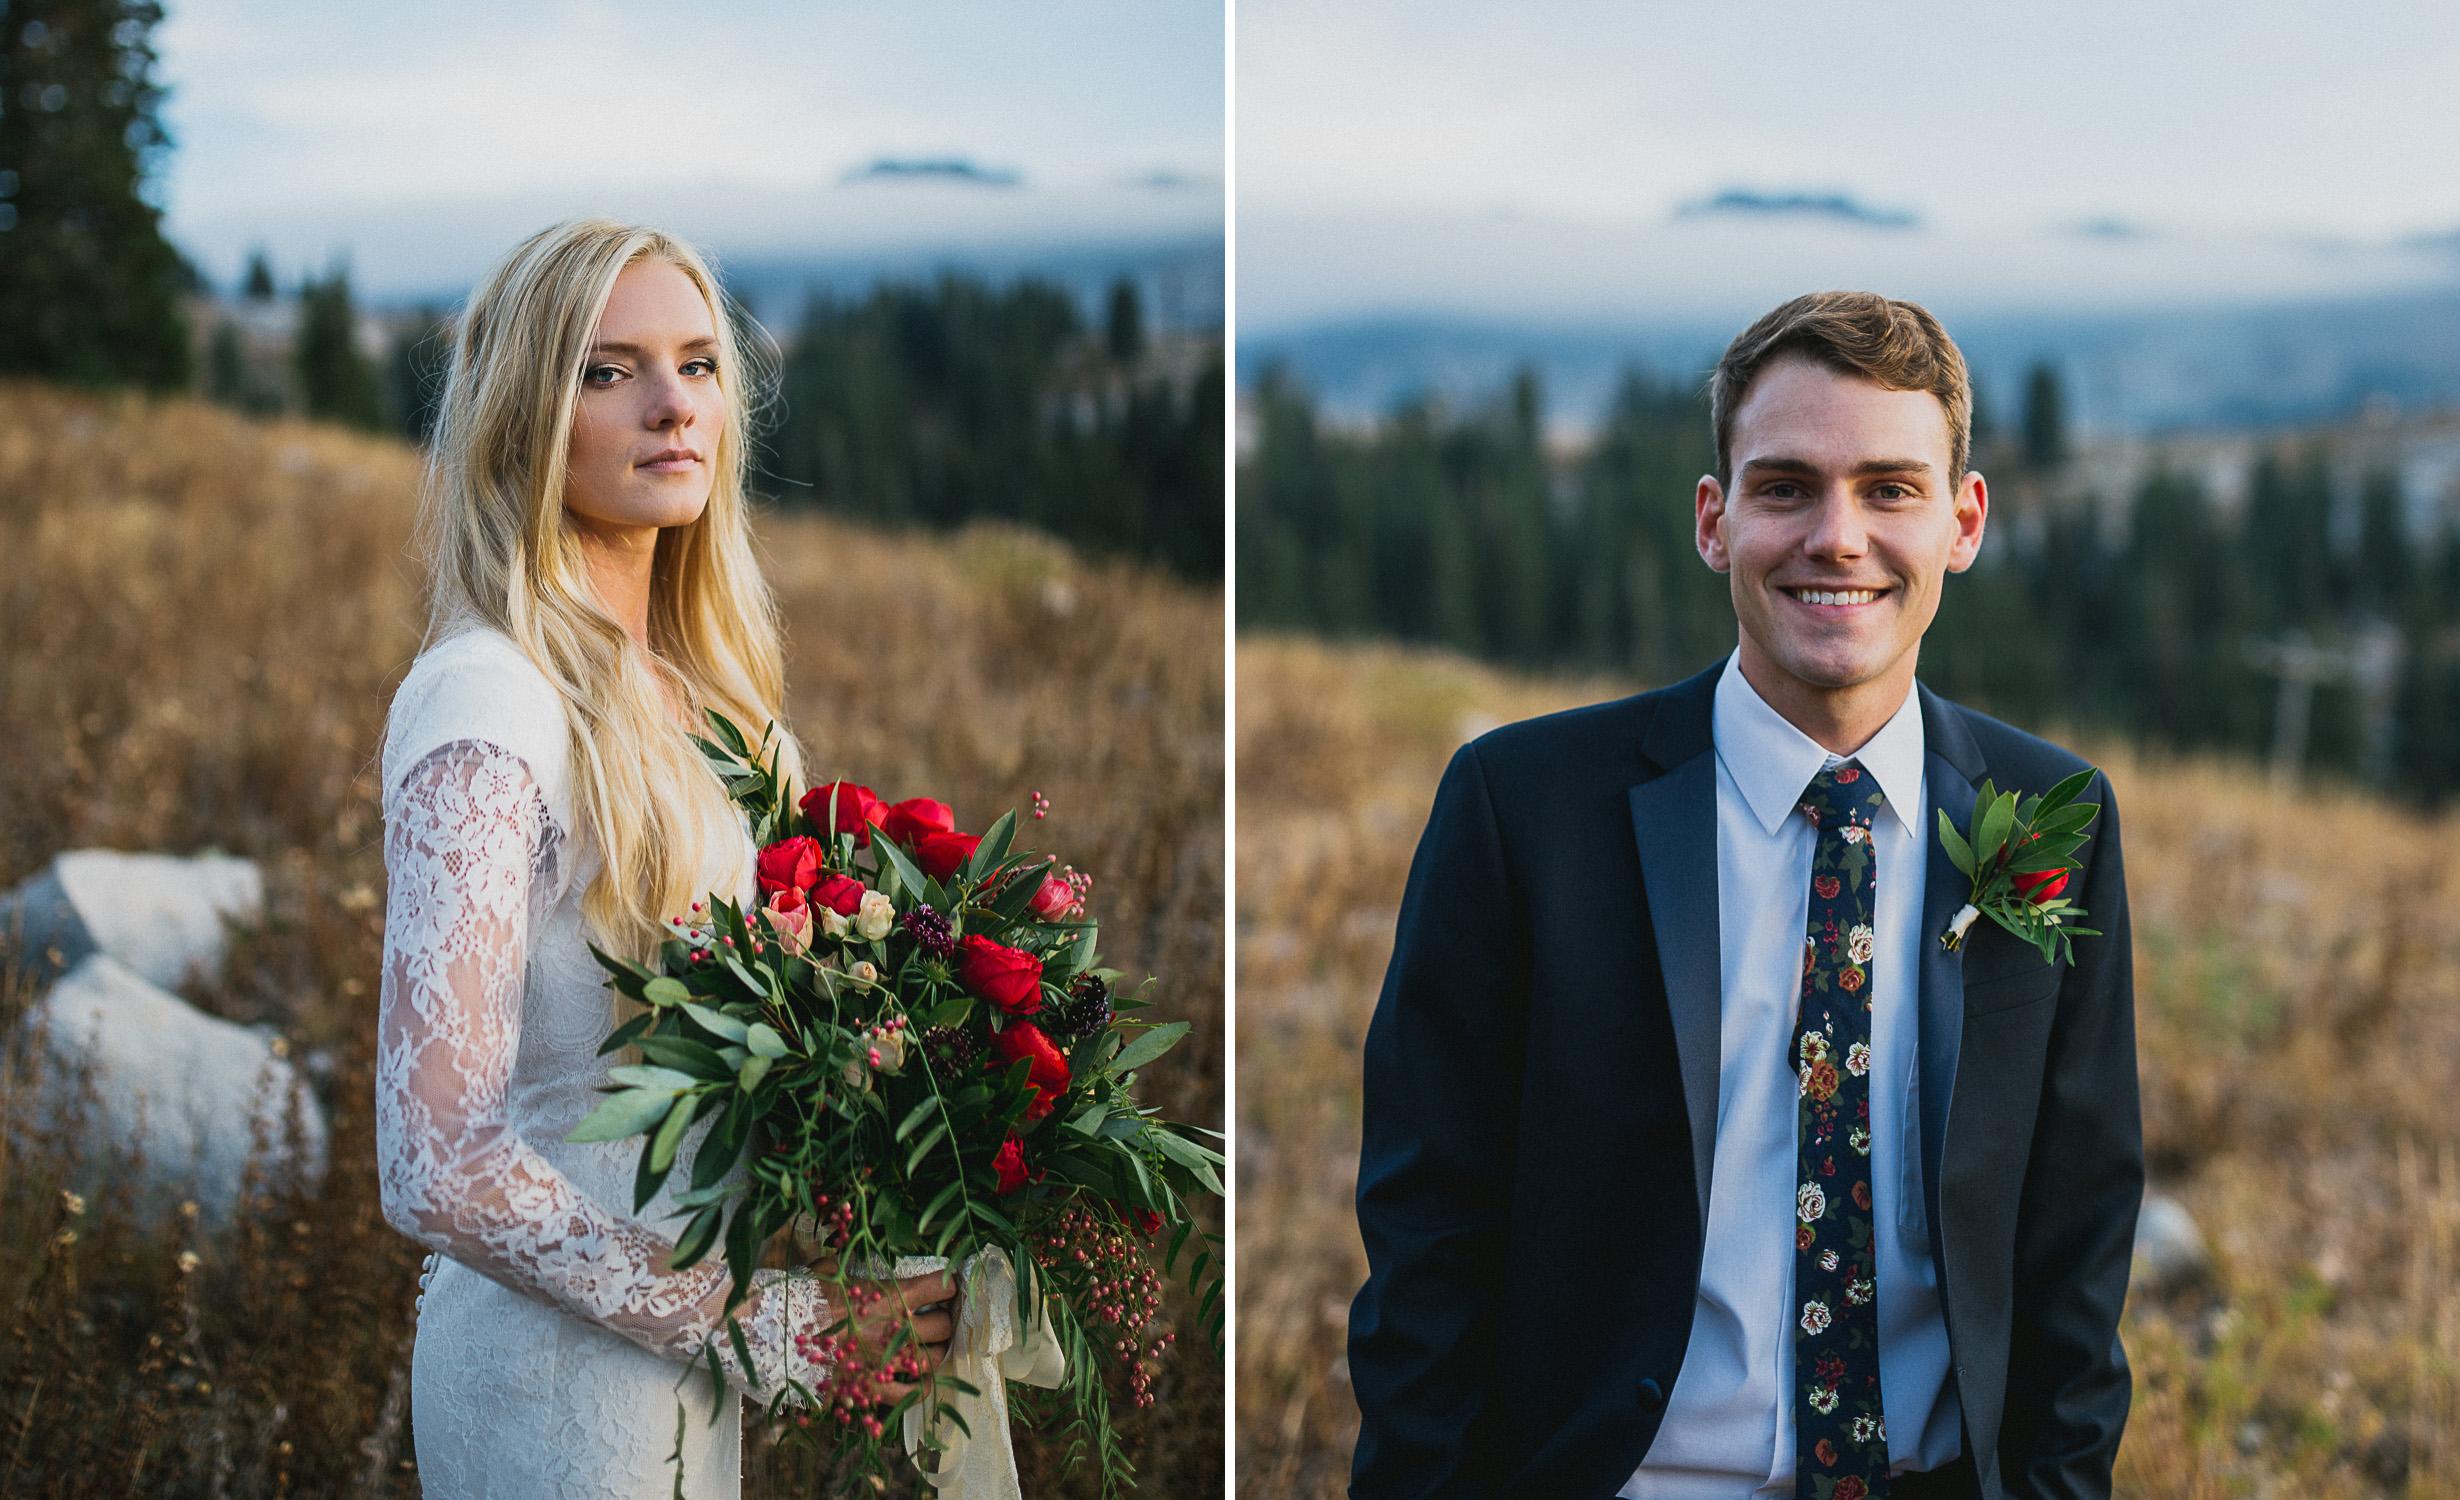 utah-wedding-photographer-salt-lake-city05.jpg